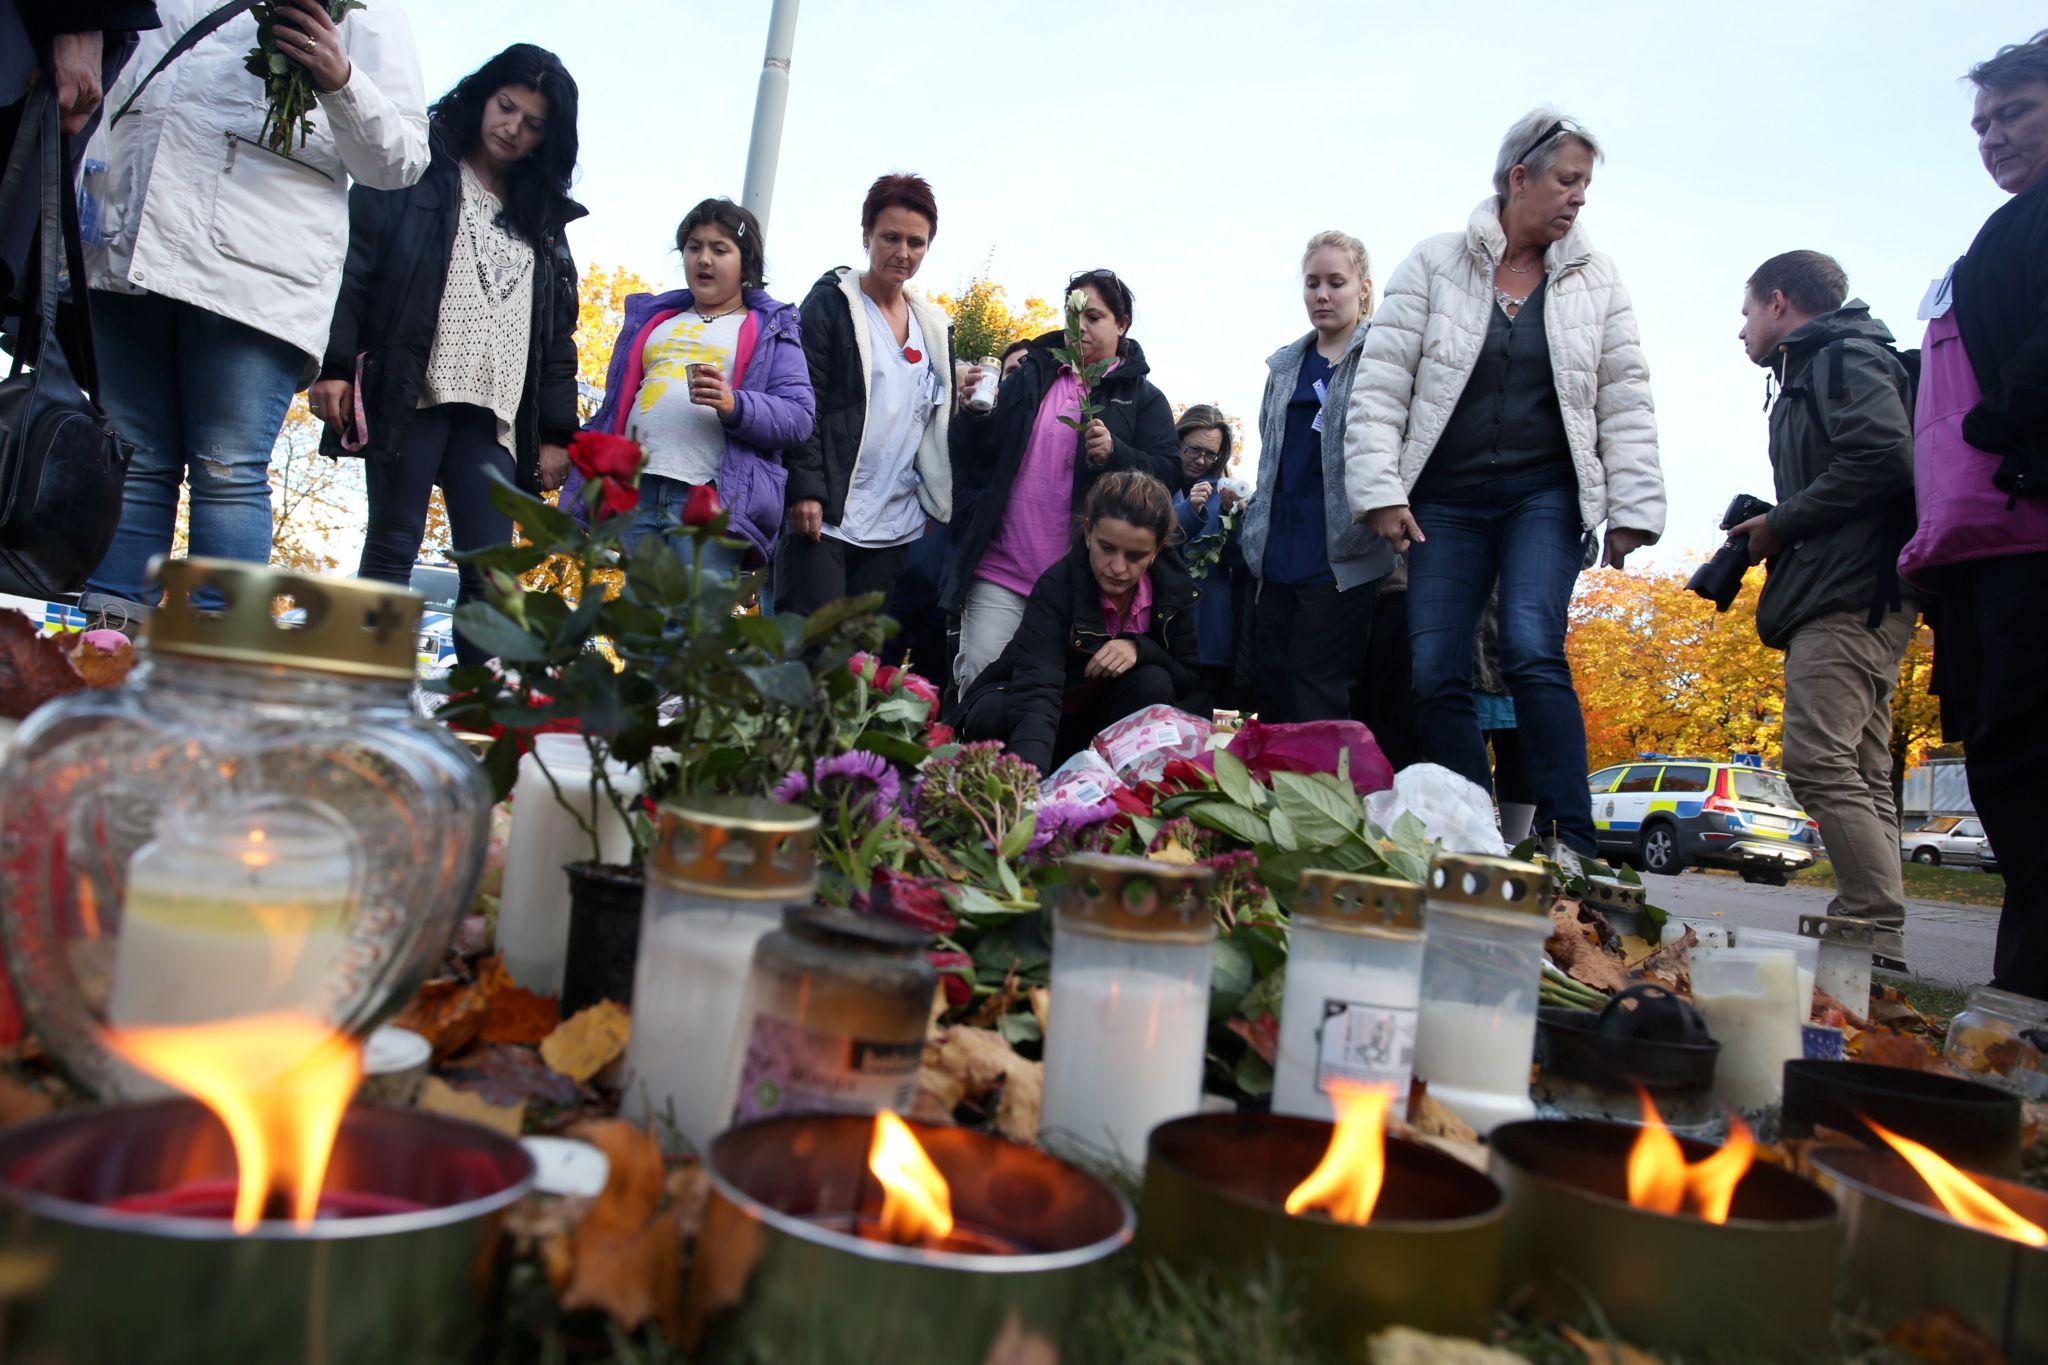 People light candles outside Kronan school in Trollhattan, Sweden, Friday Oct. 23, 2015, following a knife attack on Thursday